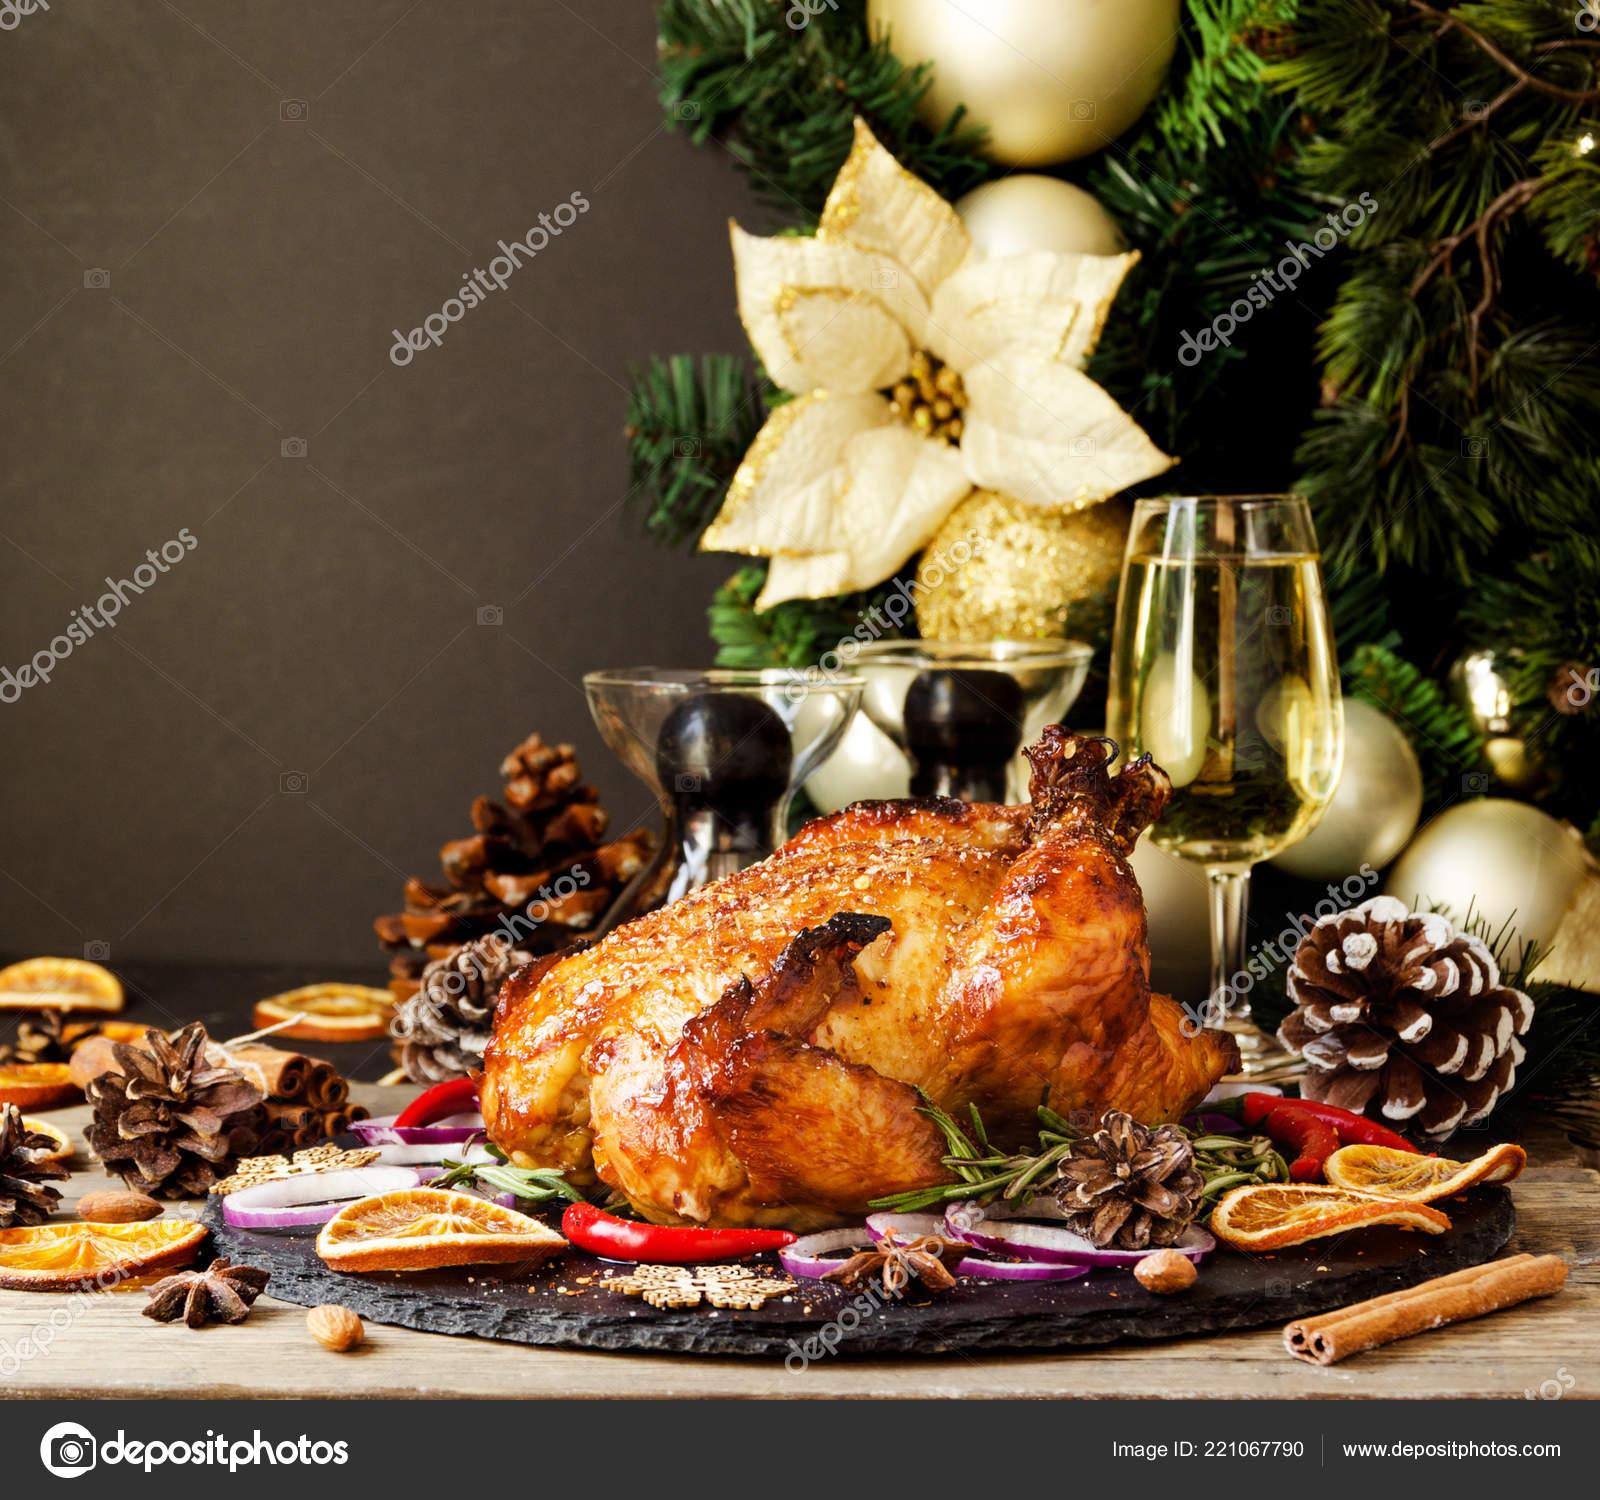 Roast Chicken Turkey Christmas New Year Thanksgiving Day